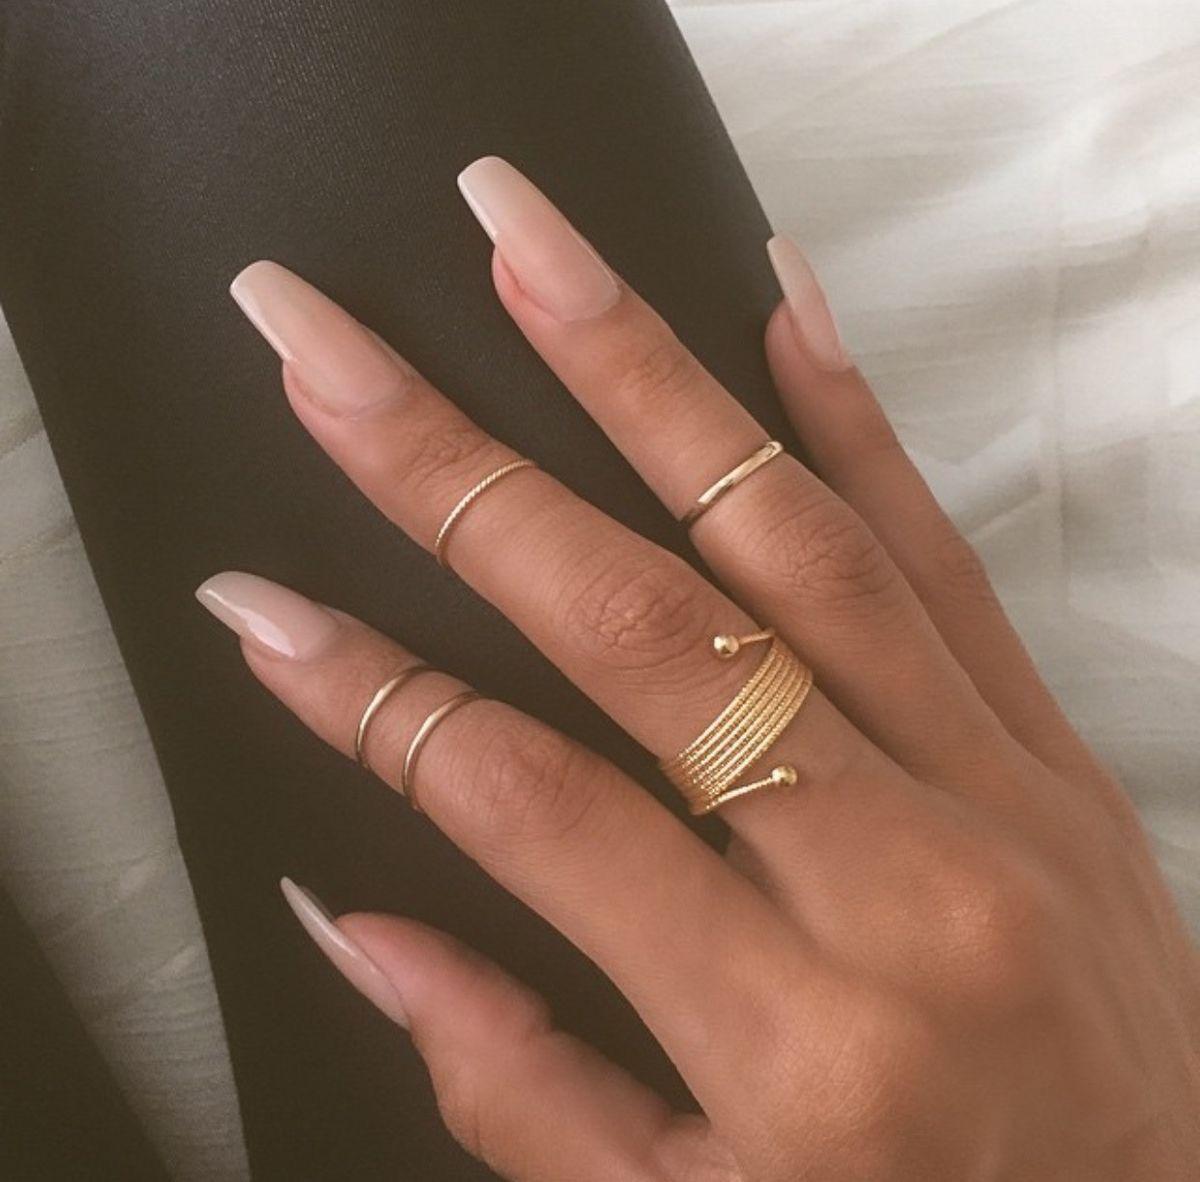 Pin by 🌸👑 on Nails | Pinterest | Nail nail, Nail inspo and Manicure